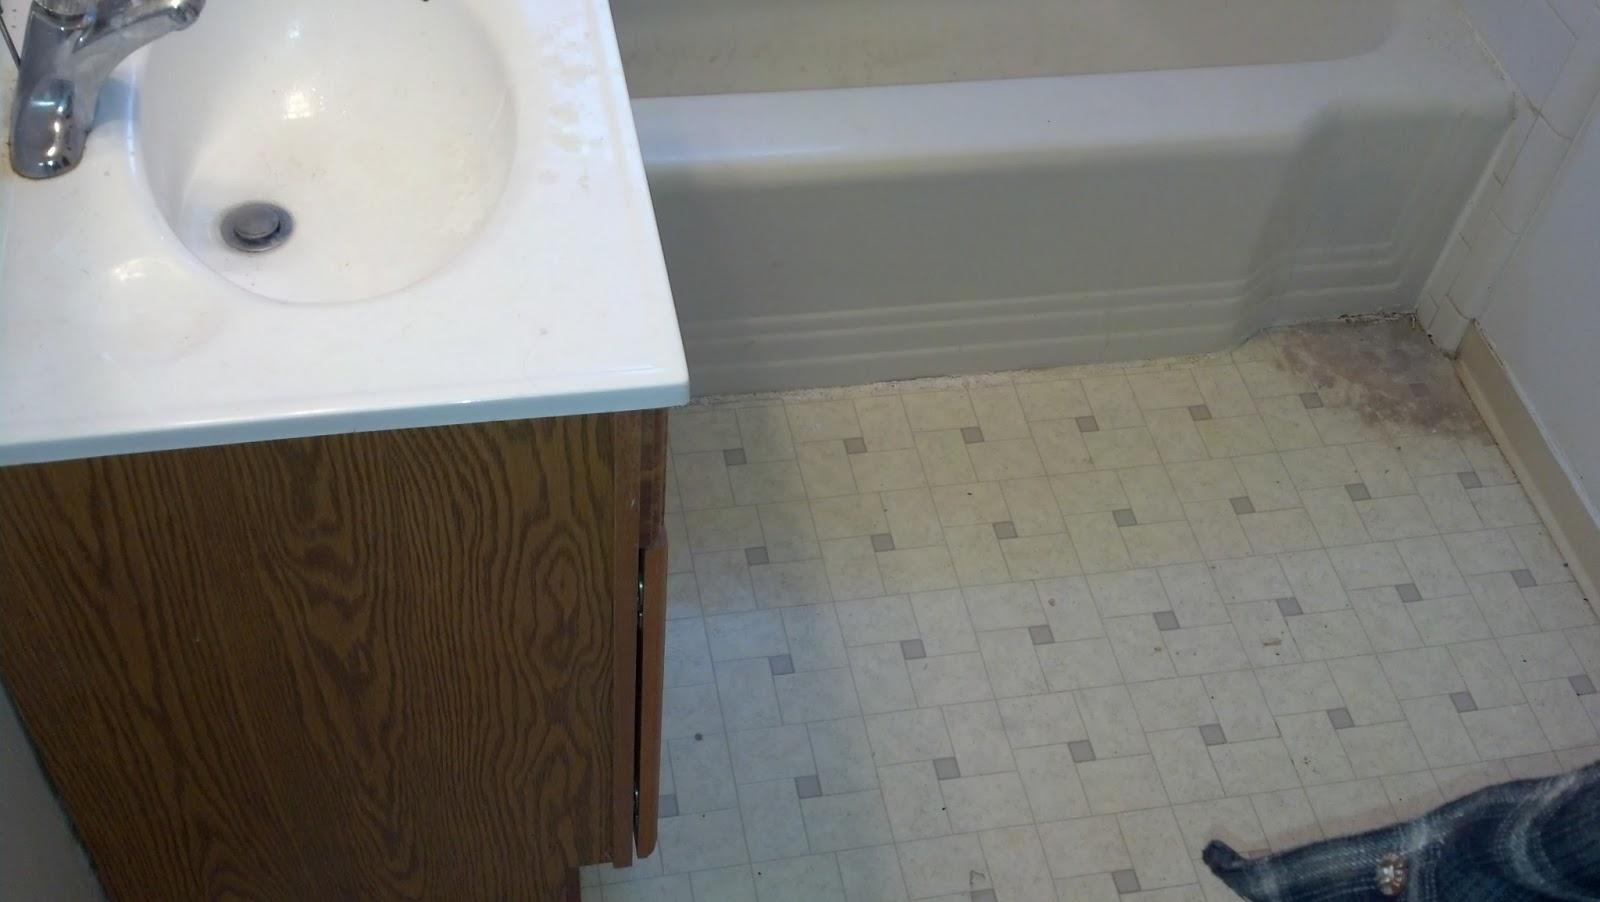 Steve S Helpful Hints Handyman Blog Recent Projects